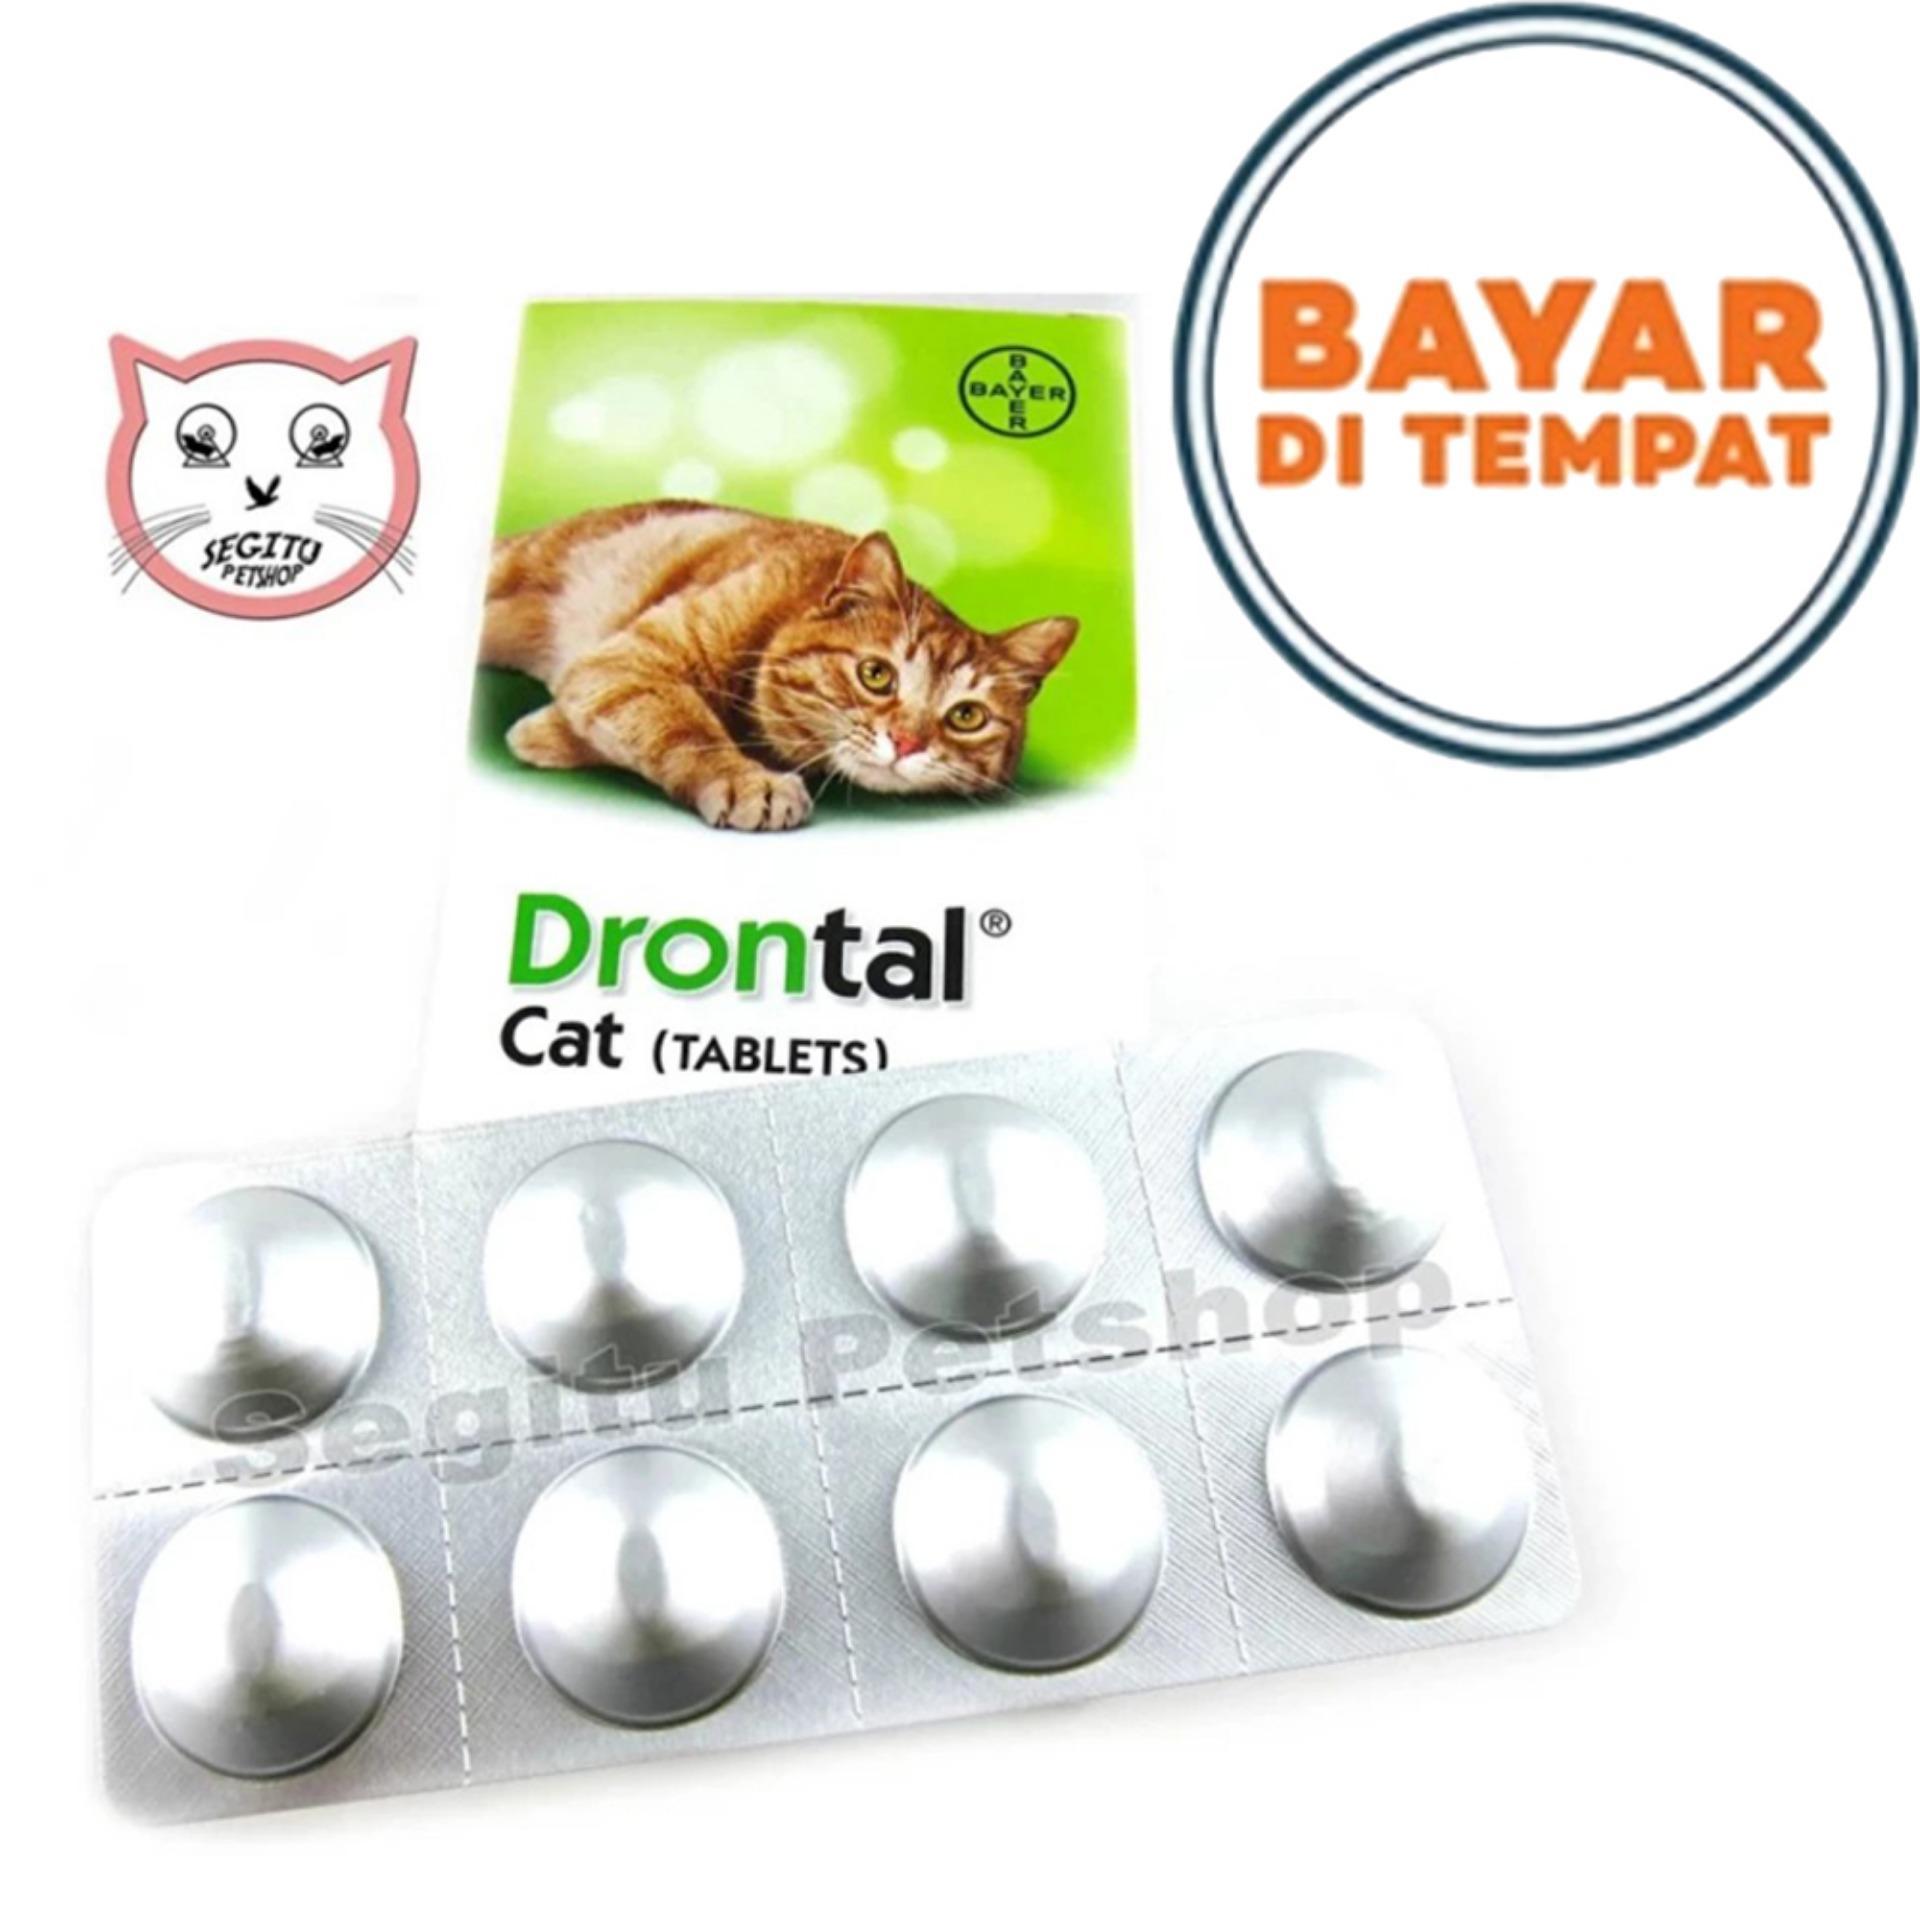 Drontal Cat Obat Cacing Kucing 1 Tablet Lazada Indonesia